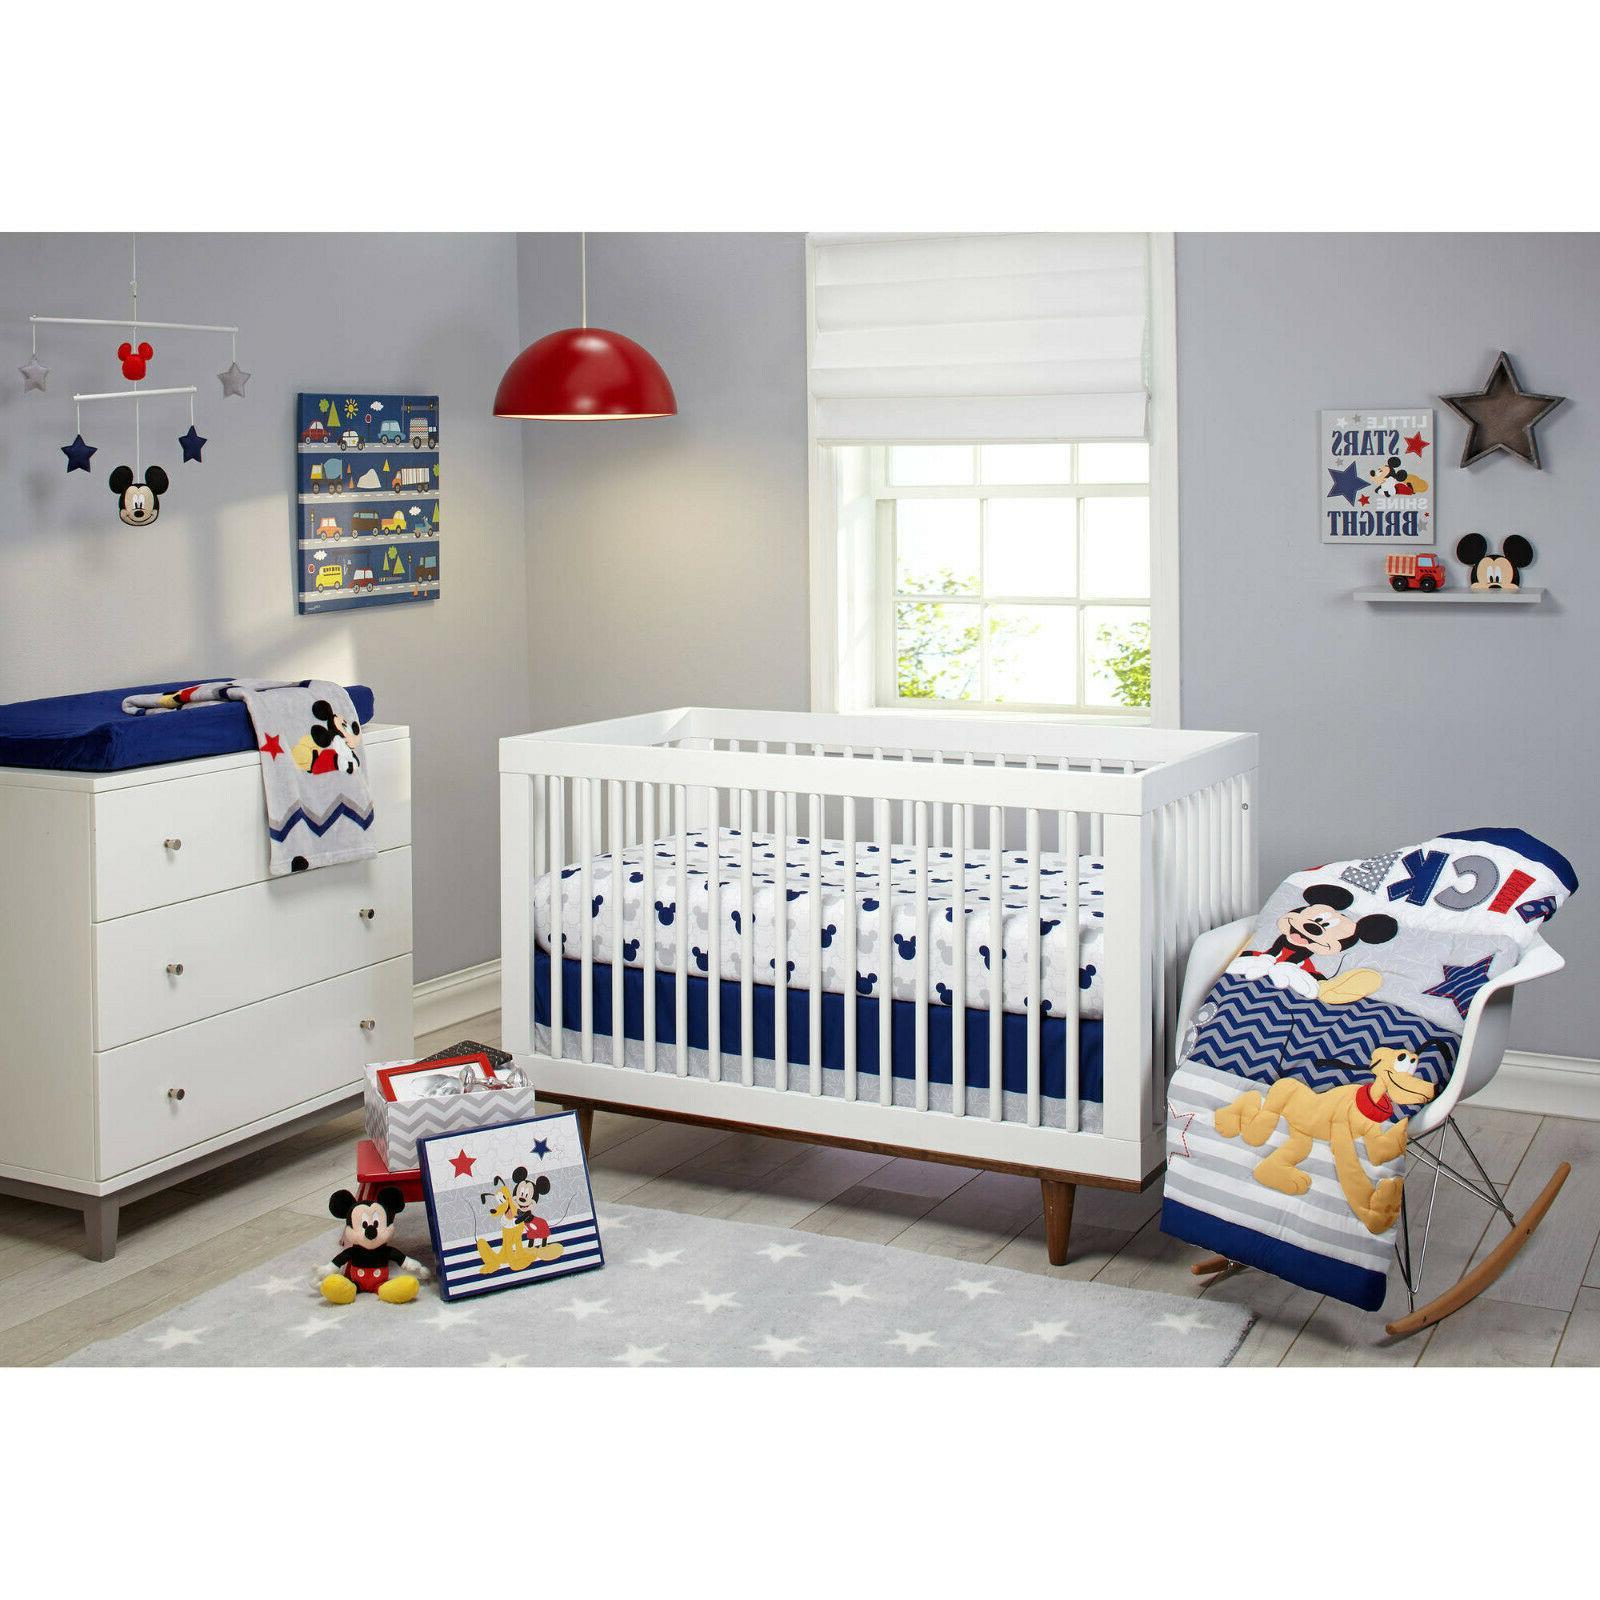 baby mickey mouse crib bedding